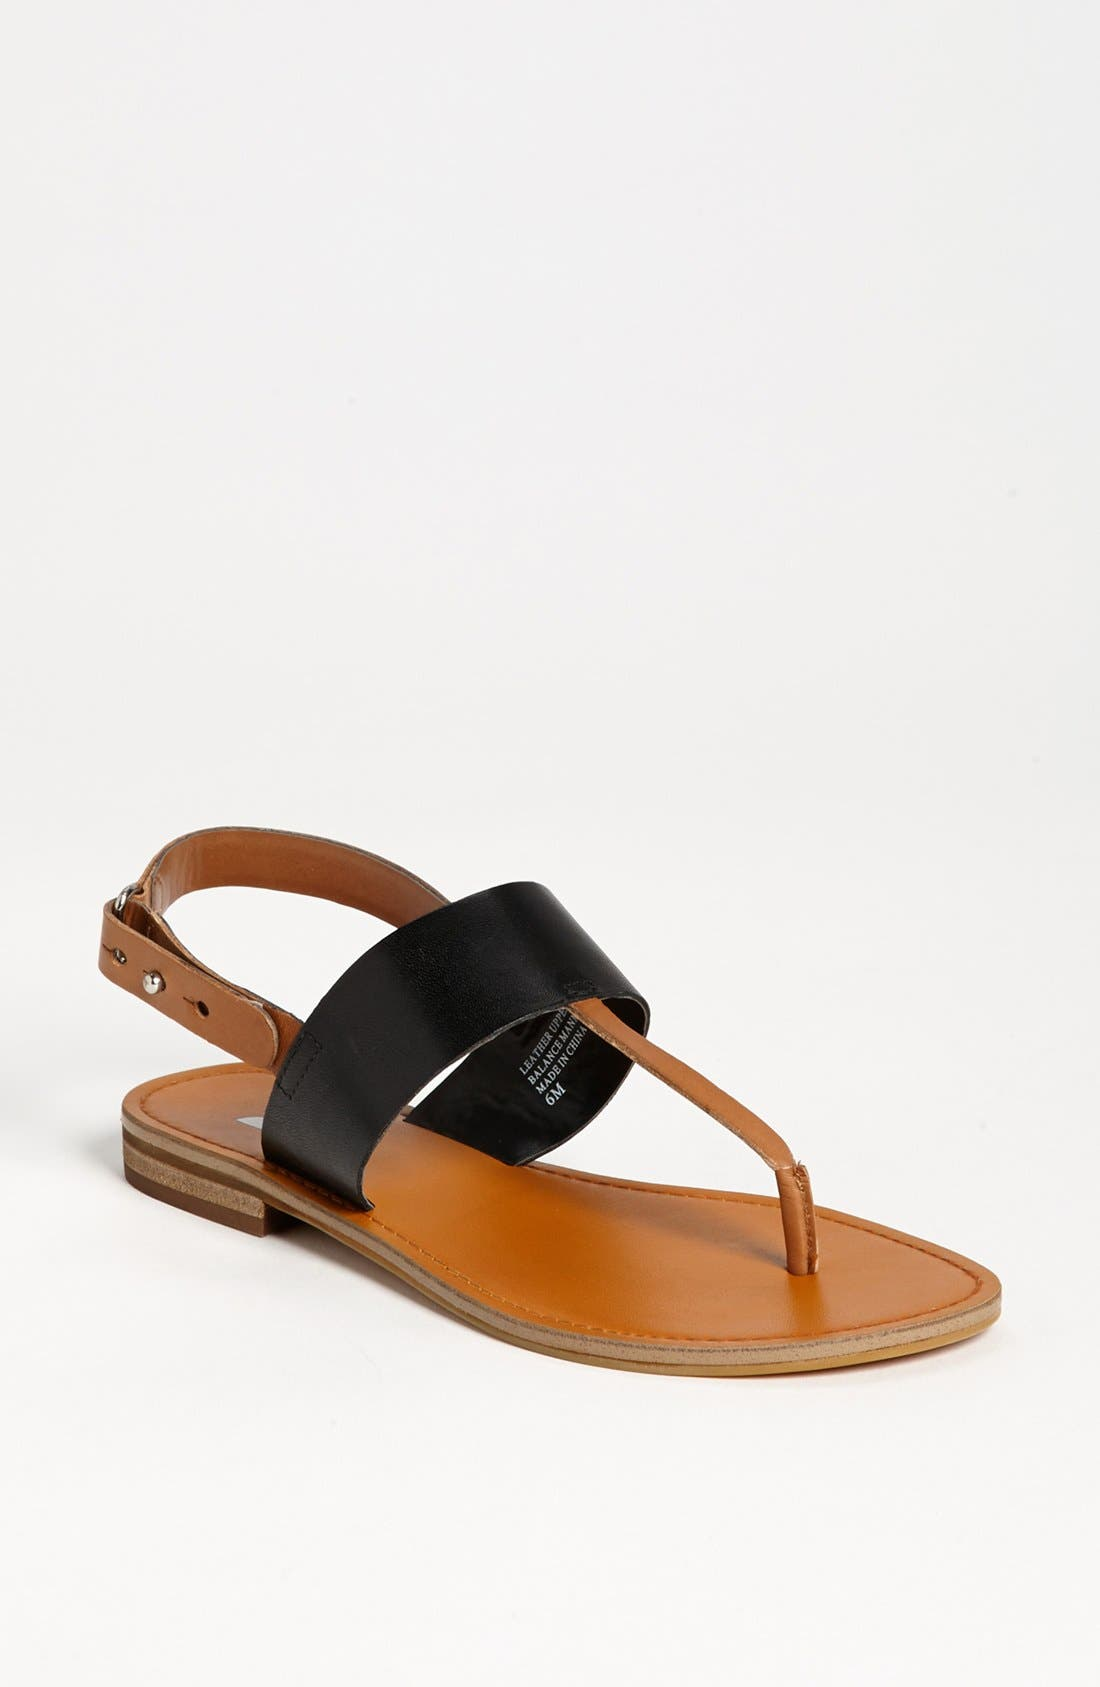 Alternate Image 1 Selected - BP. 'Barbados' Sandal